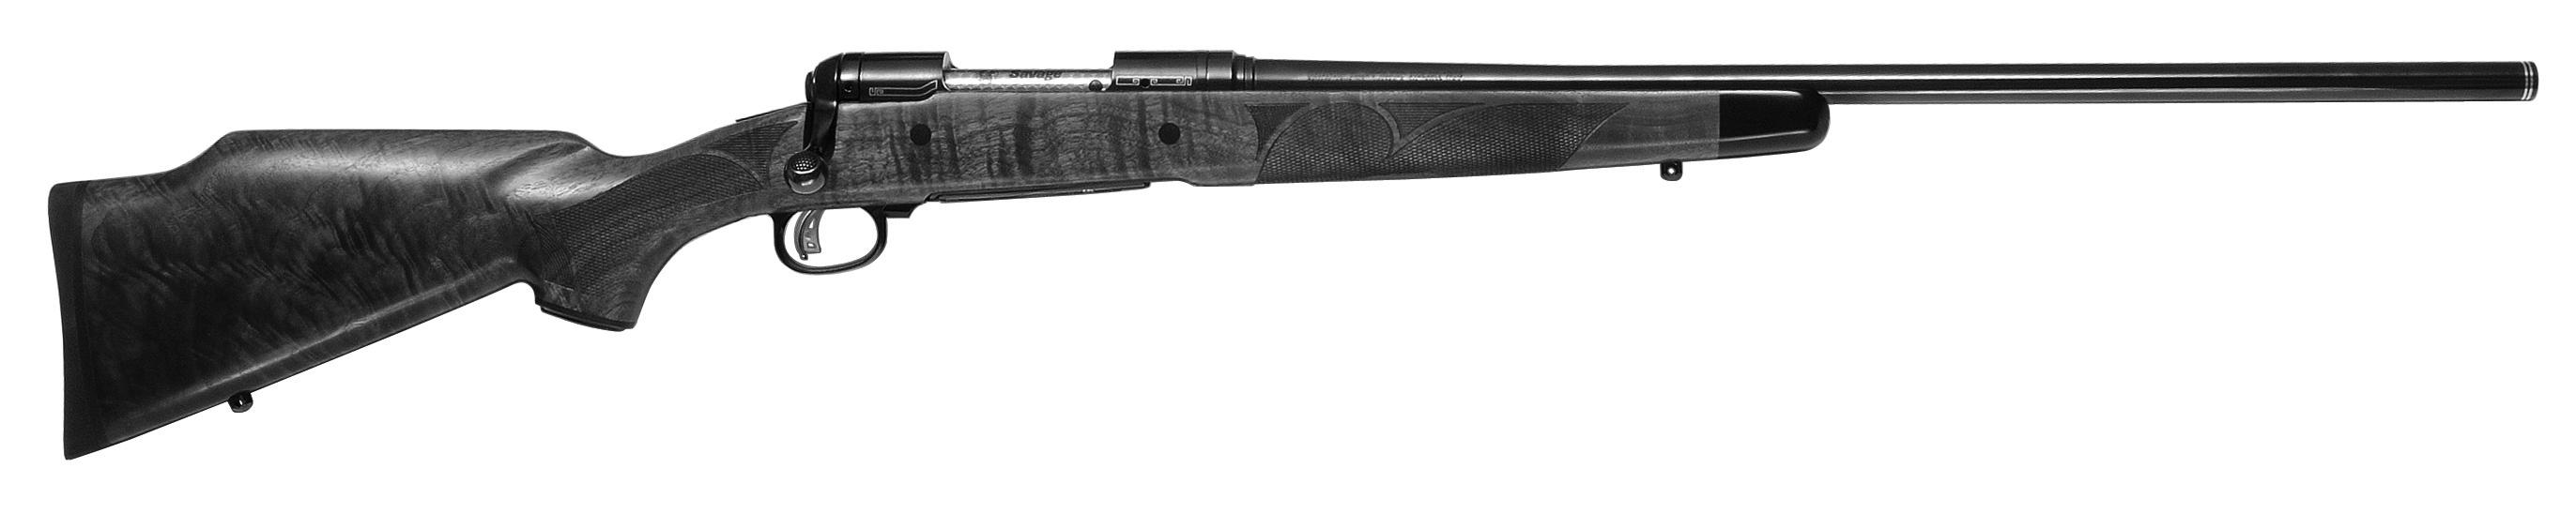 Model 110-Fiftieth Anniversary